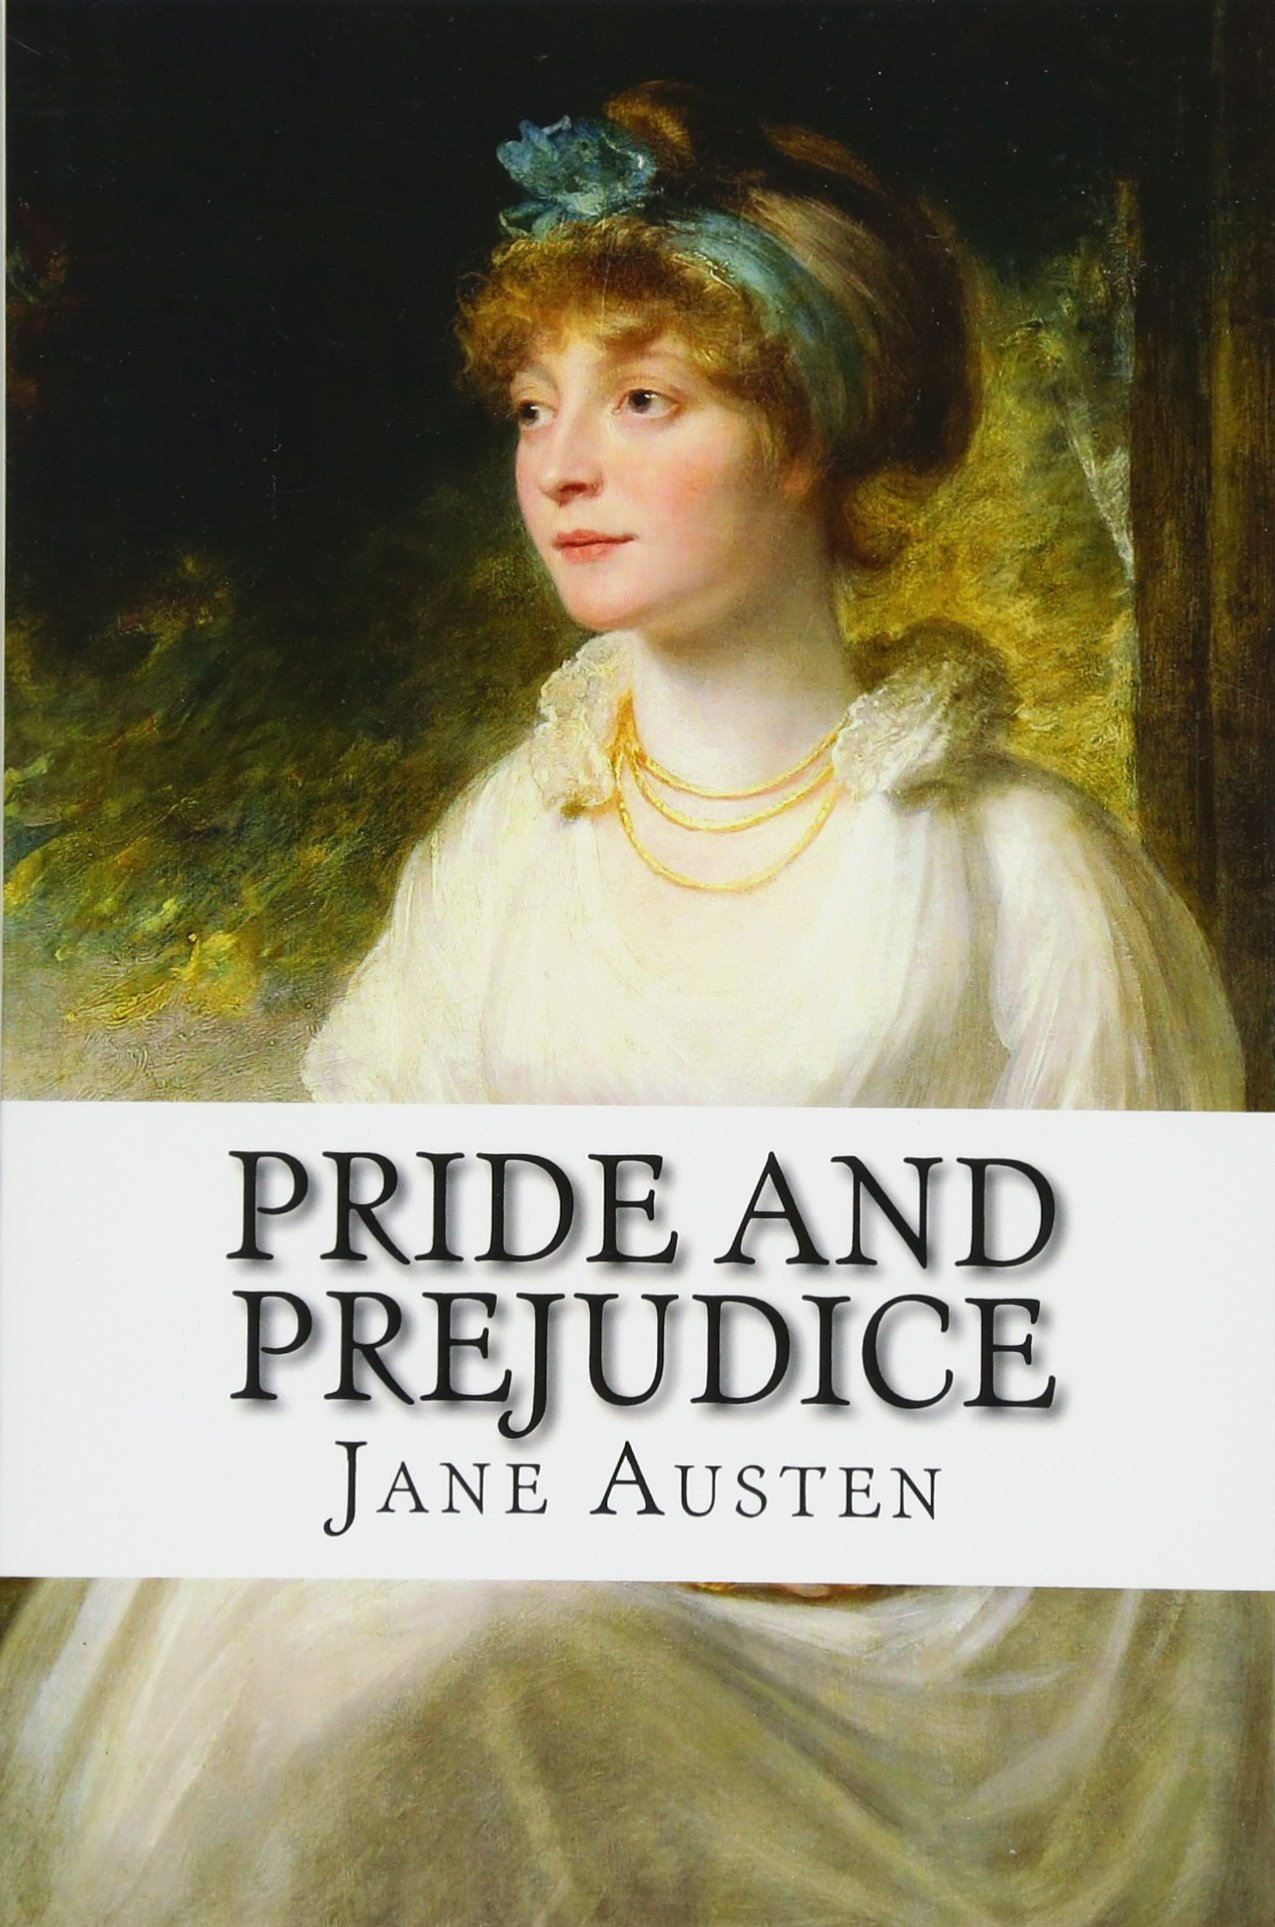 Comments on Pride and Prejudice (Jane Austen)